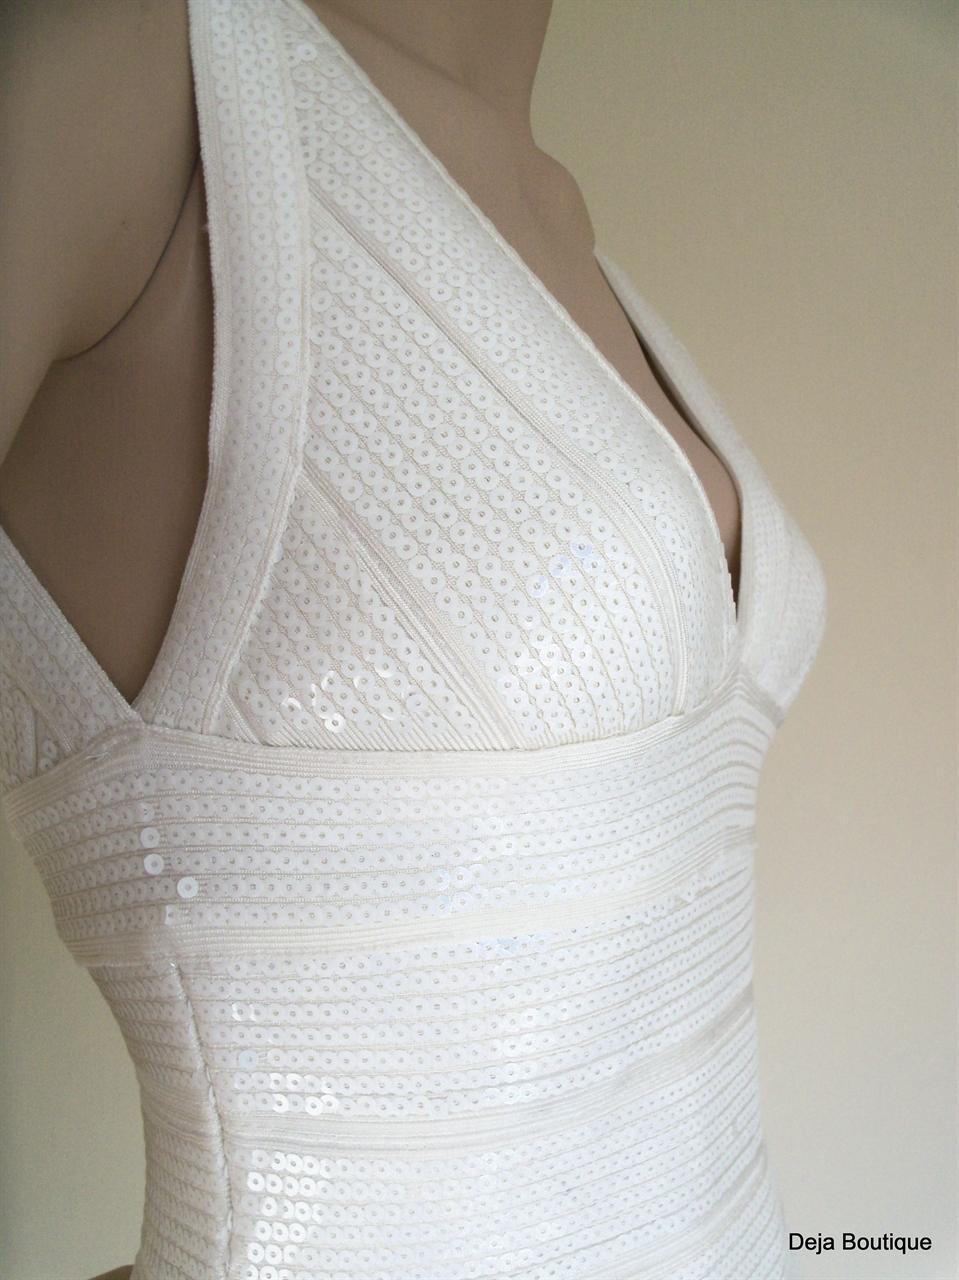 Deja Boutique. Marbella white sequin bandage dress